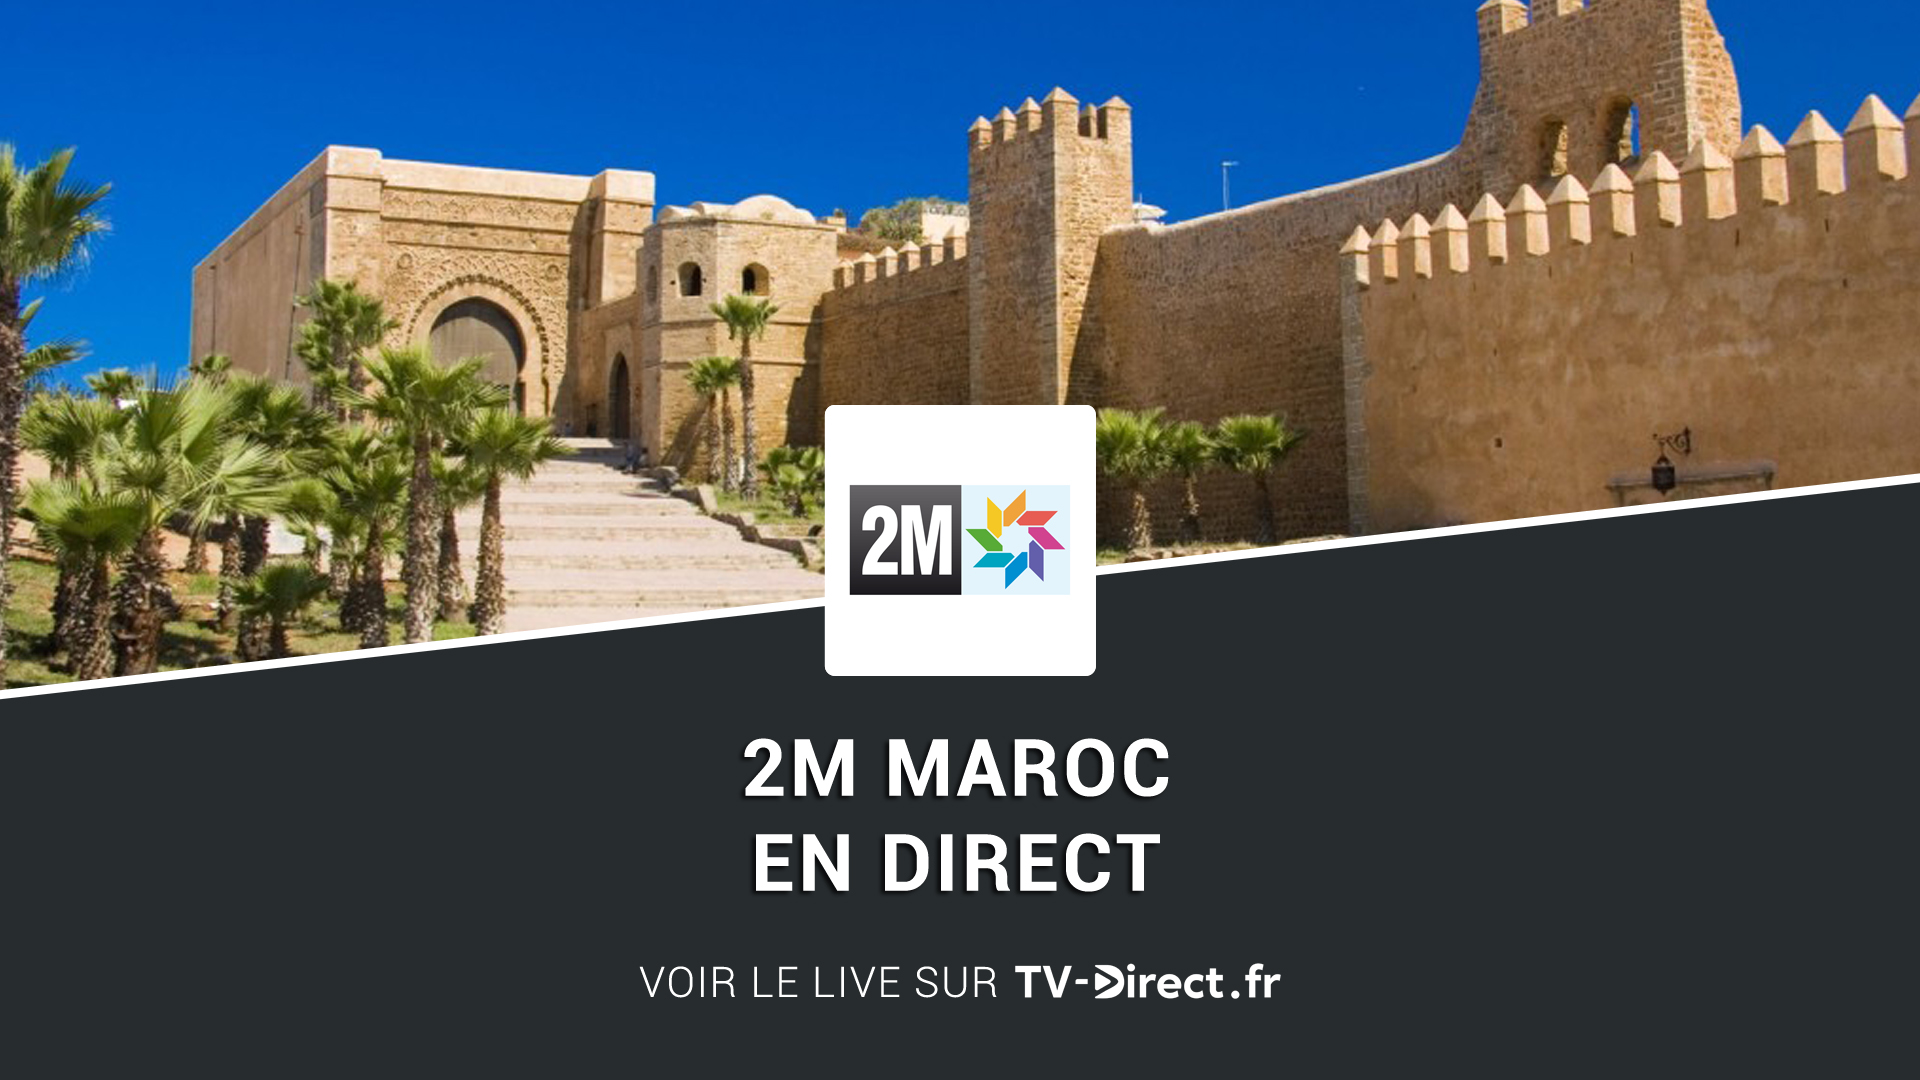 2m maroc direct regarder 2m maroc en direct live sur internet. Black Bedroom Furniture Sets. Home Design Ideas